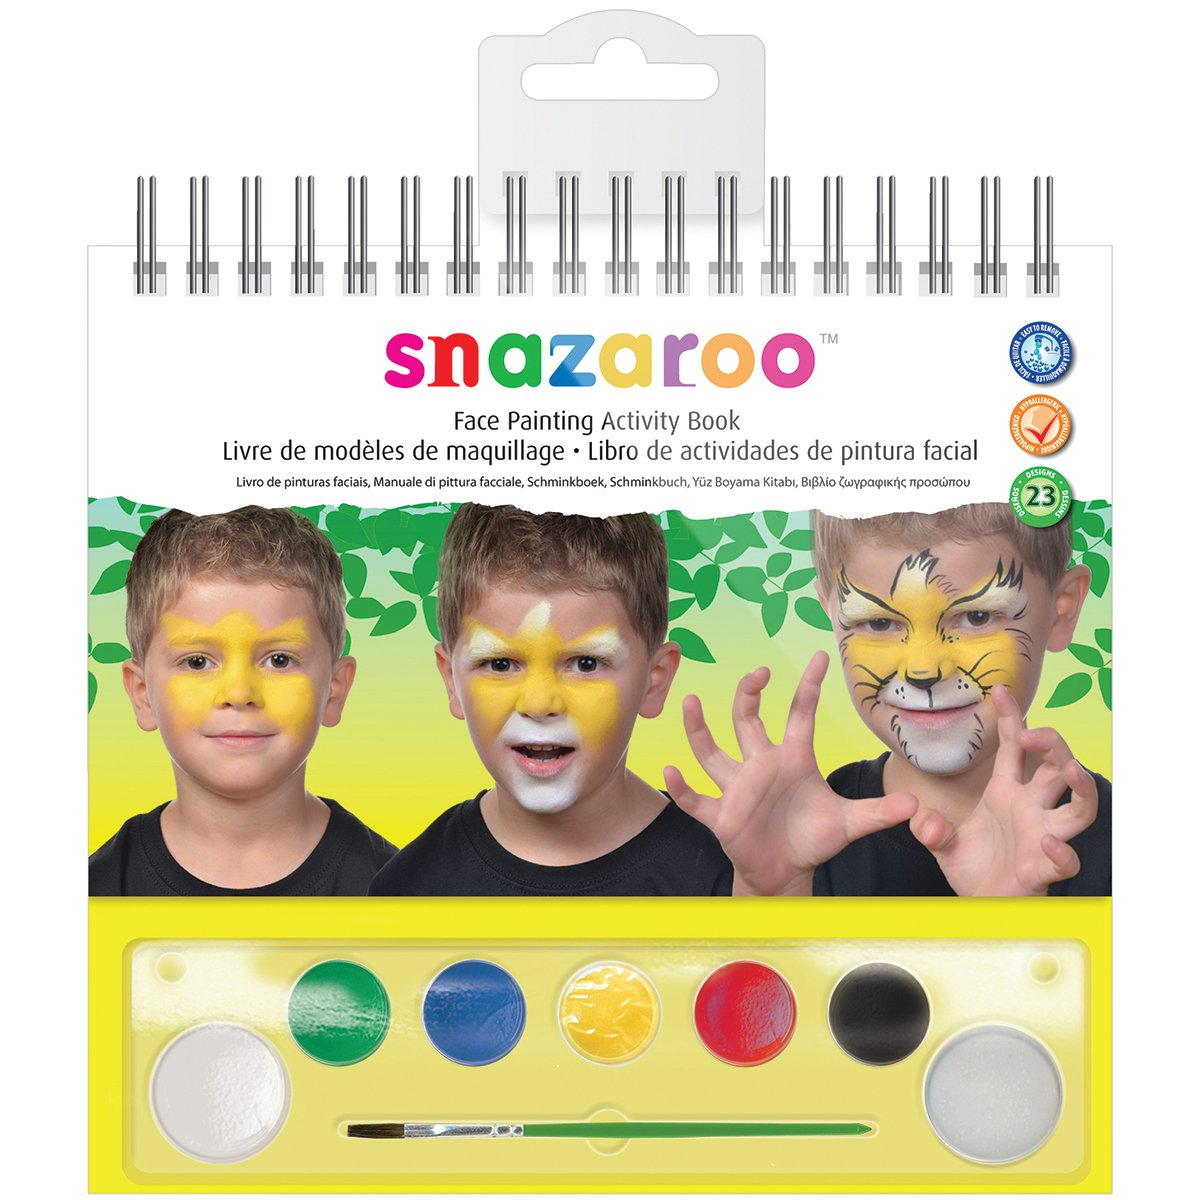 Amazoncom Snazaroo Face Painting Activity Book